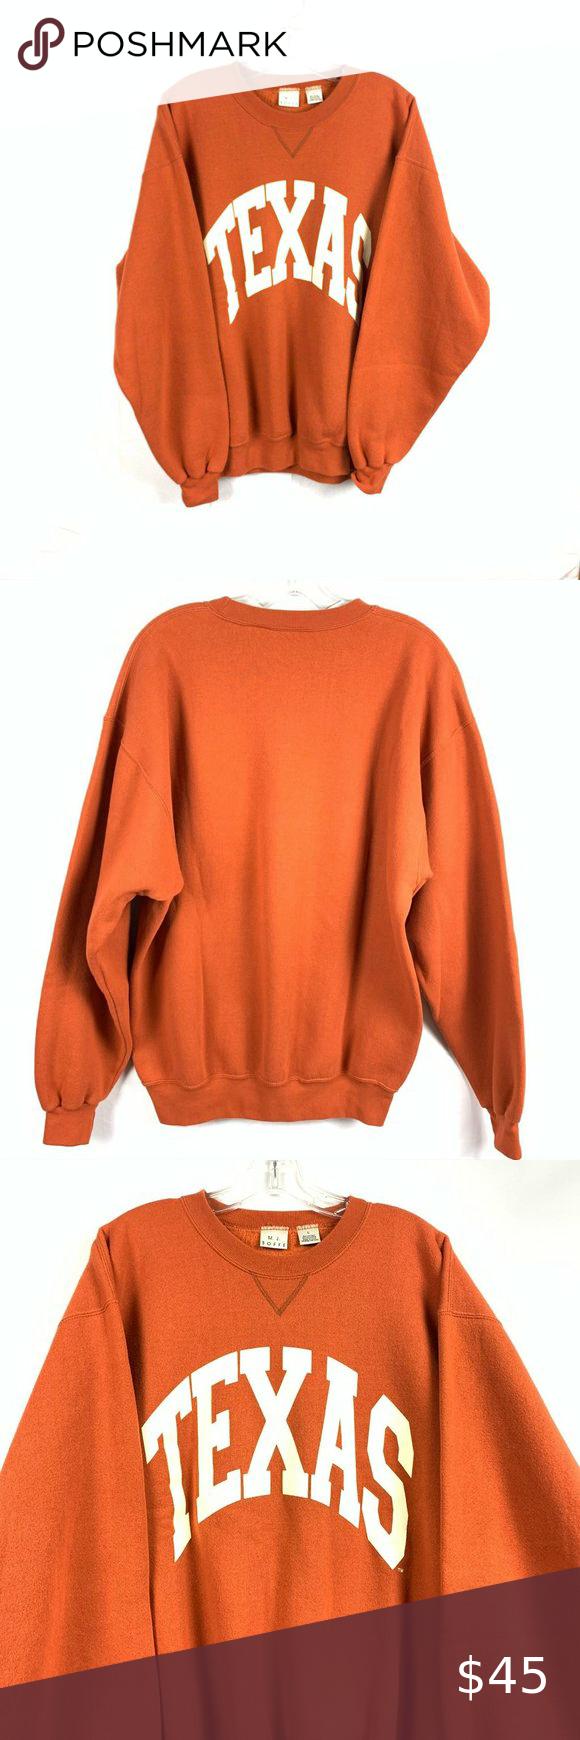 Lind Sweatshirt Burnt Orange Men S Sweatshirts Wax London Orange Outfit Mens Hottest Fashion Long Sleeve Tshirt Men [ 1200 x 800 Pixel ]